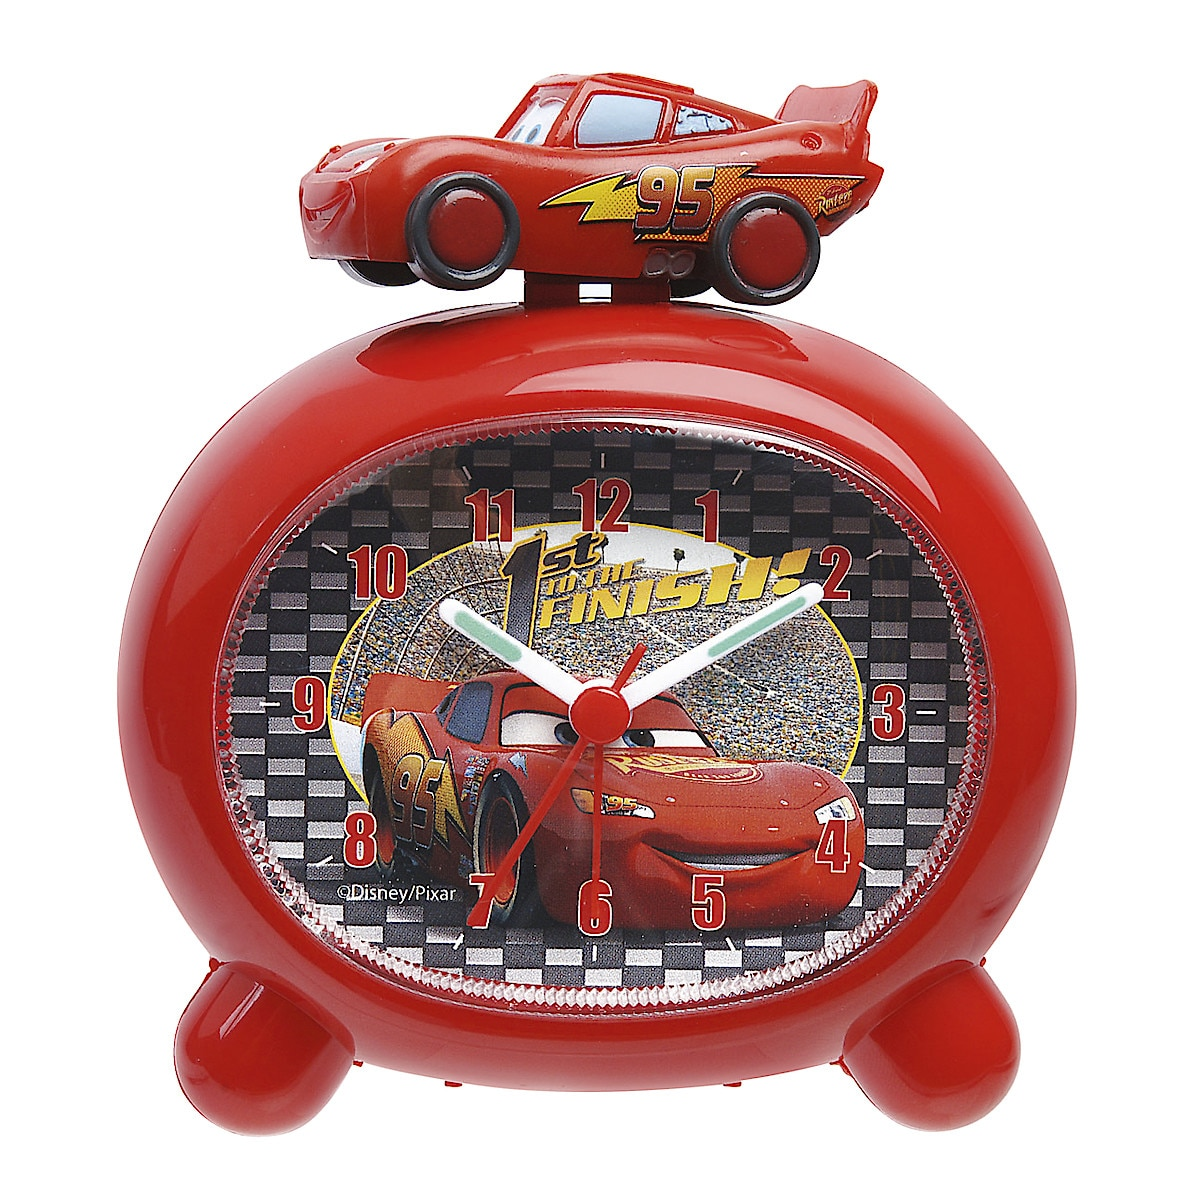 Disney Cars Alarm Clock